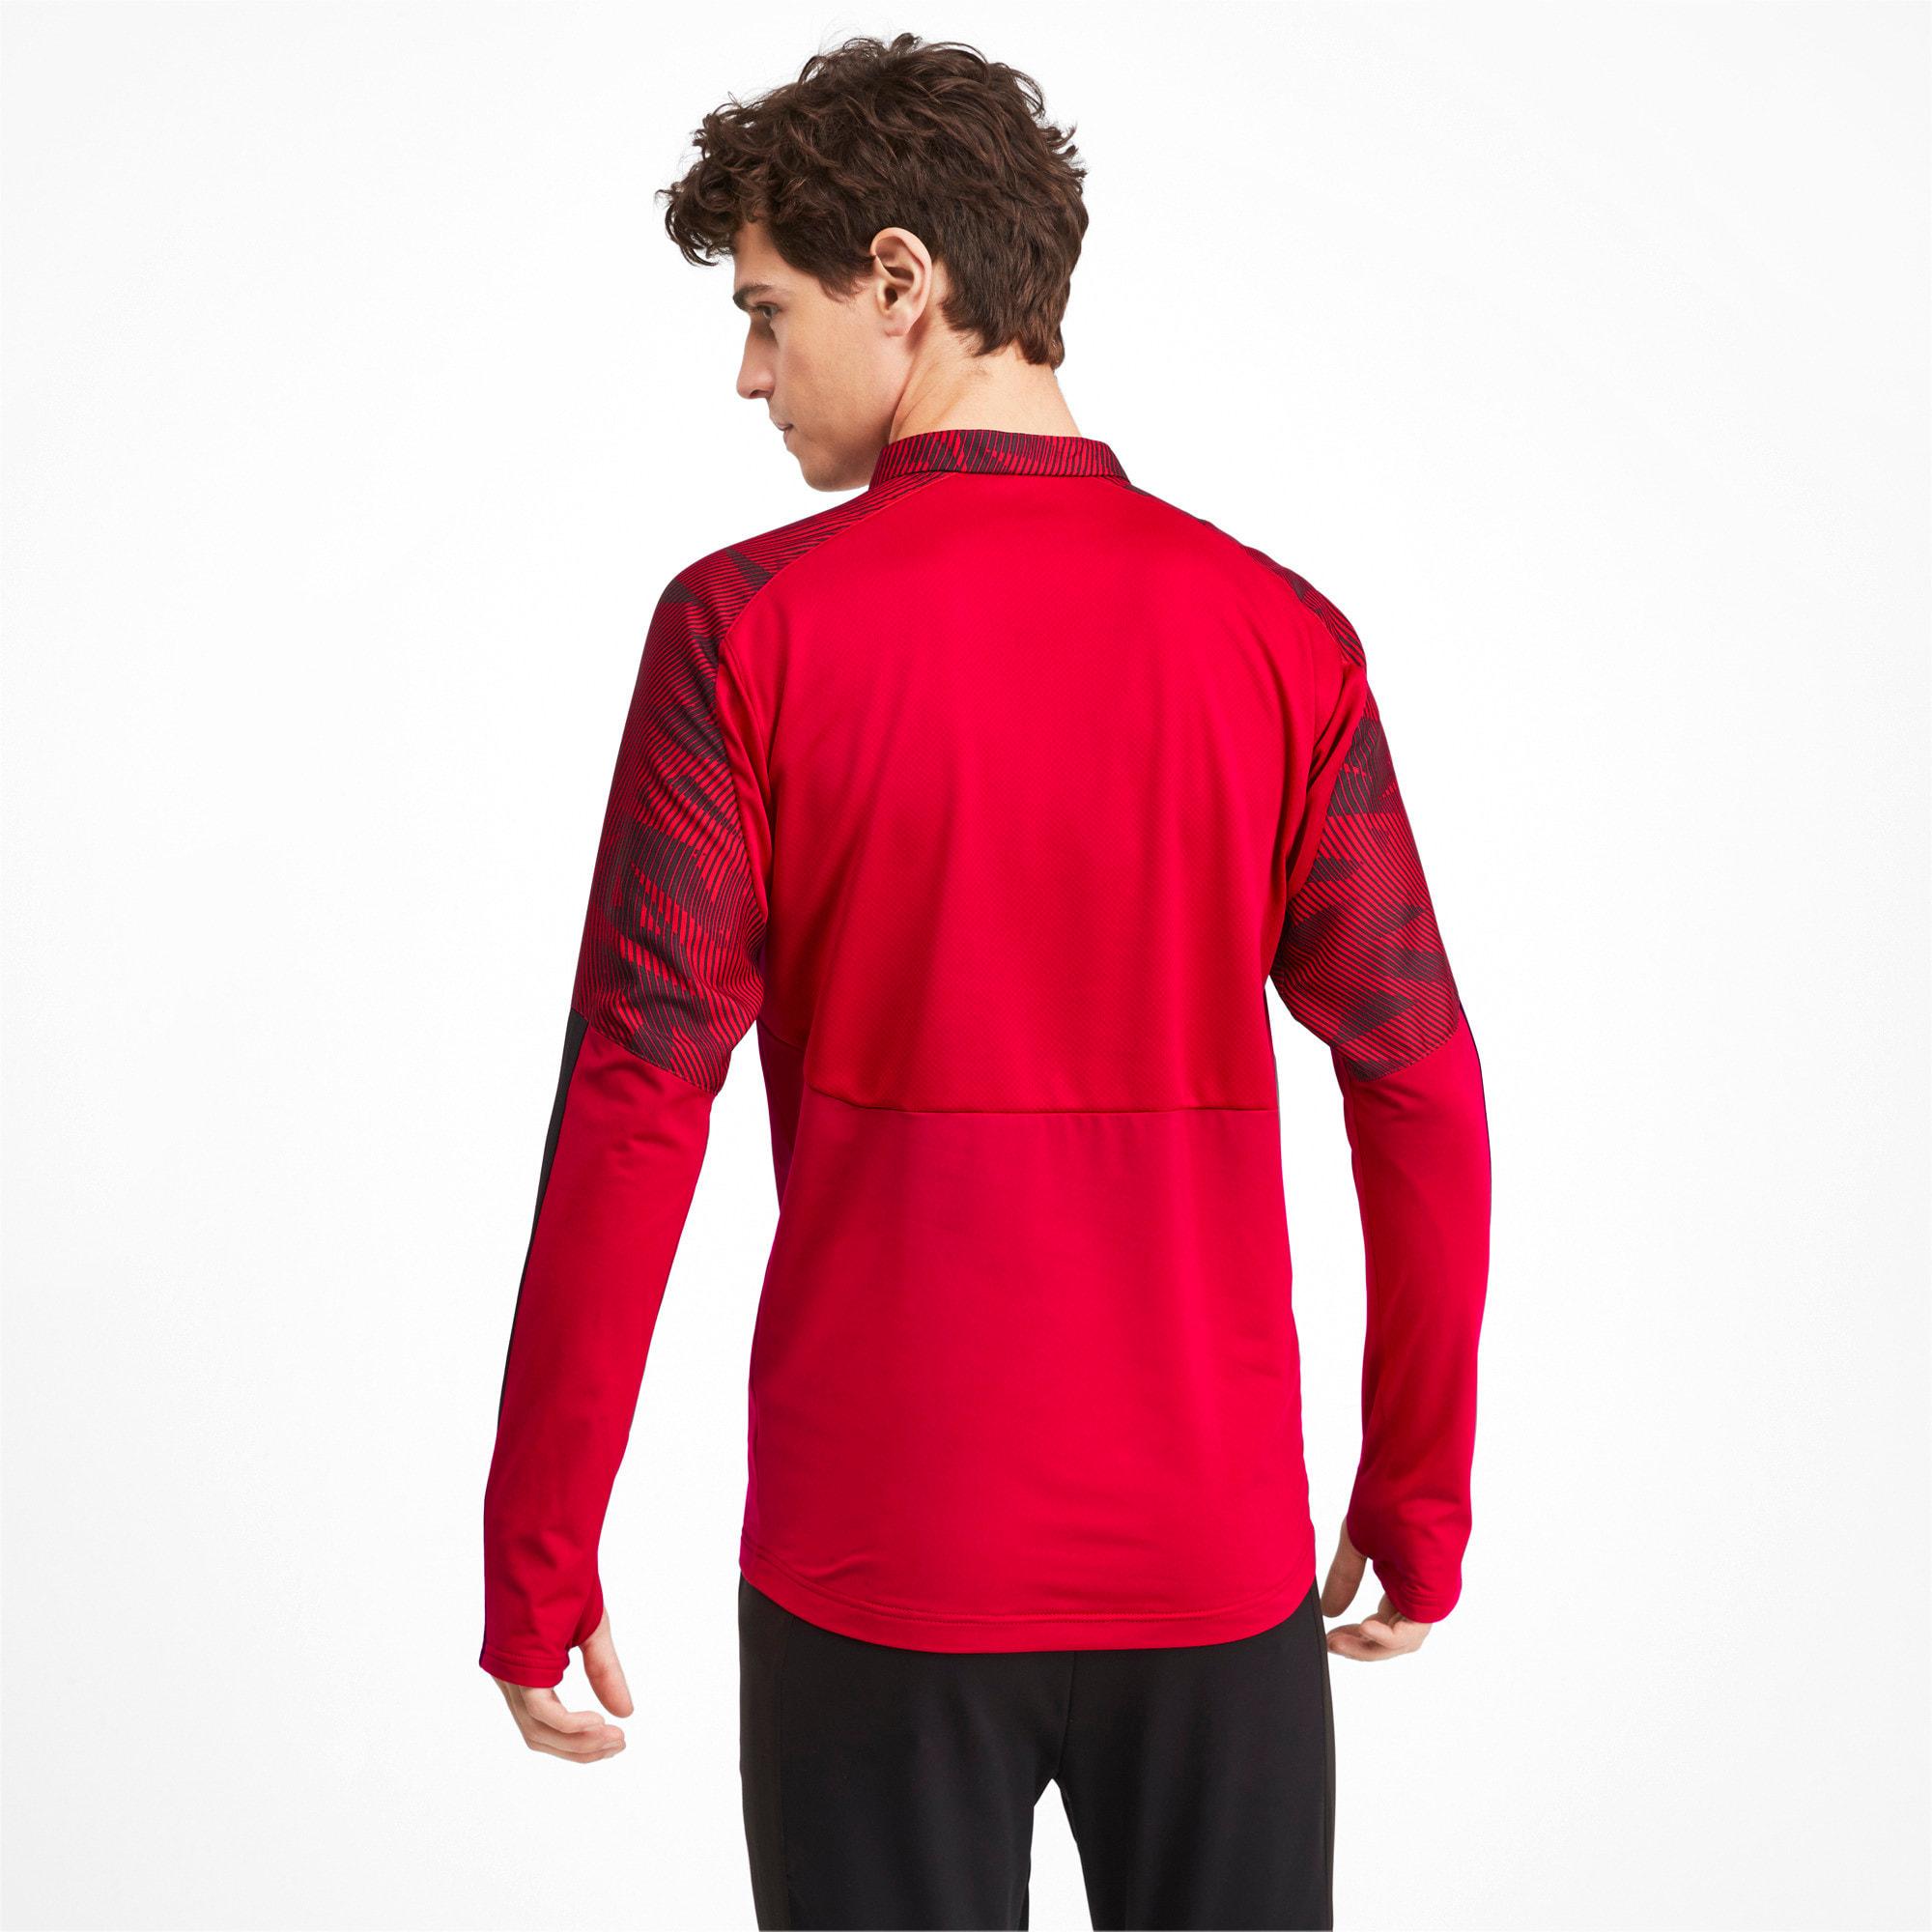 Thumbnail 2 of AC Milan Men's 1/4 Zip Top, Tango Red -Puma Black, medium